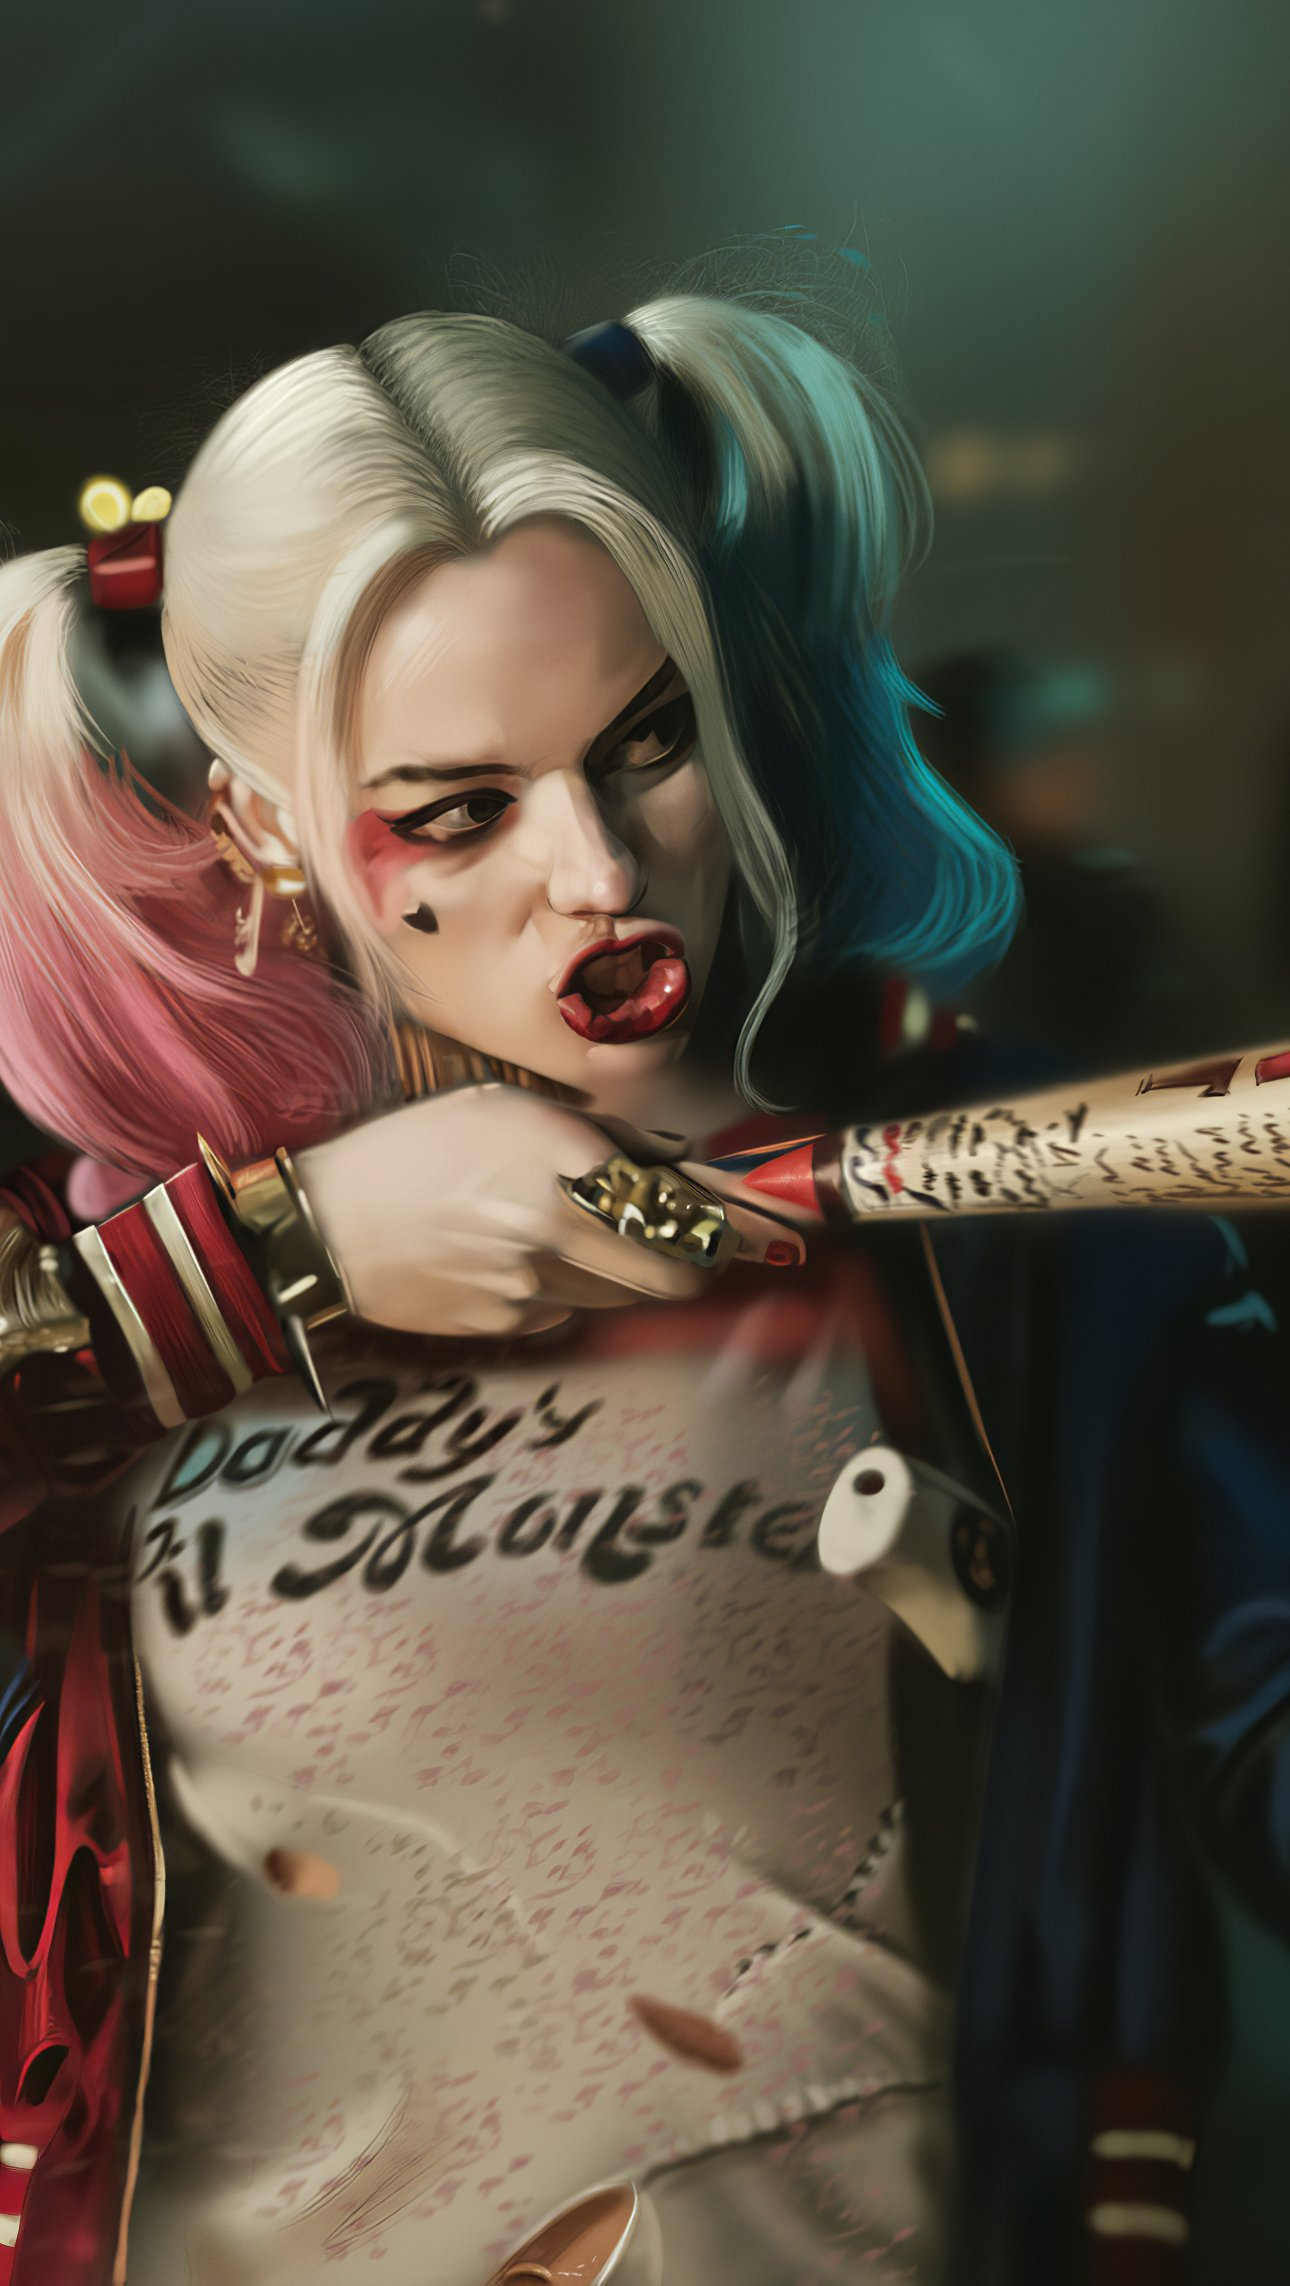 Fondos de pantalla Margot Robbie como Harley Quinn Fanart Vertical